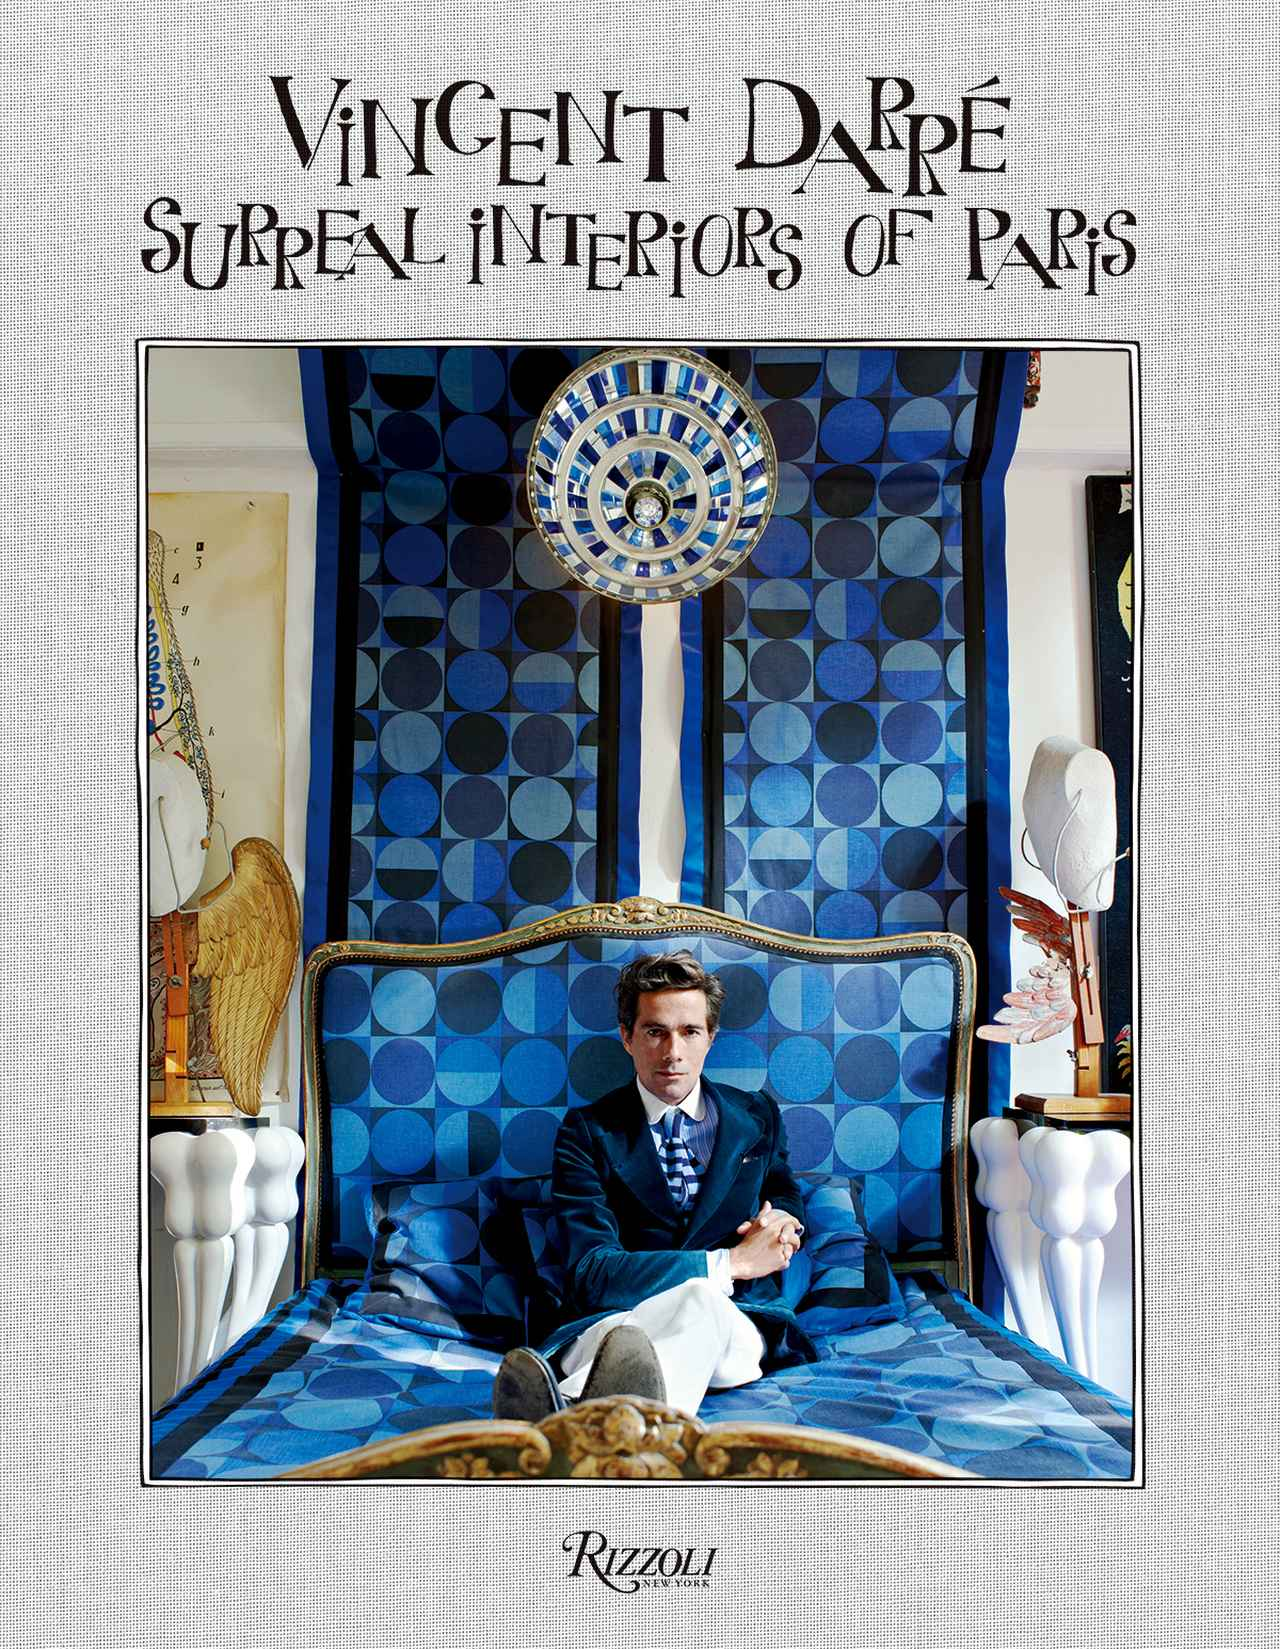 Images : 『Vincent Darré Surreal Interiors of Paris』 ¥7,700/RIZZOLI